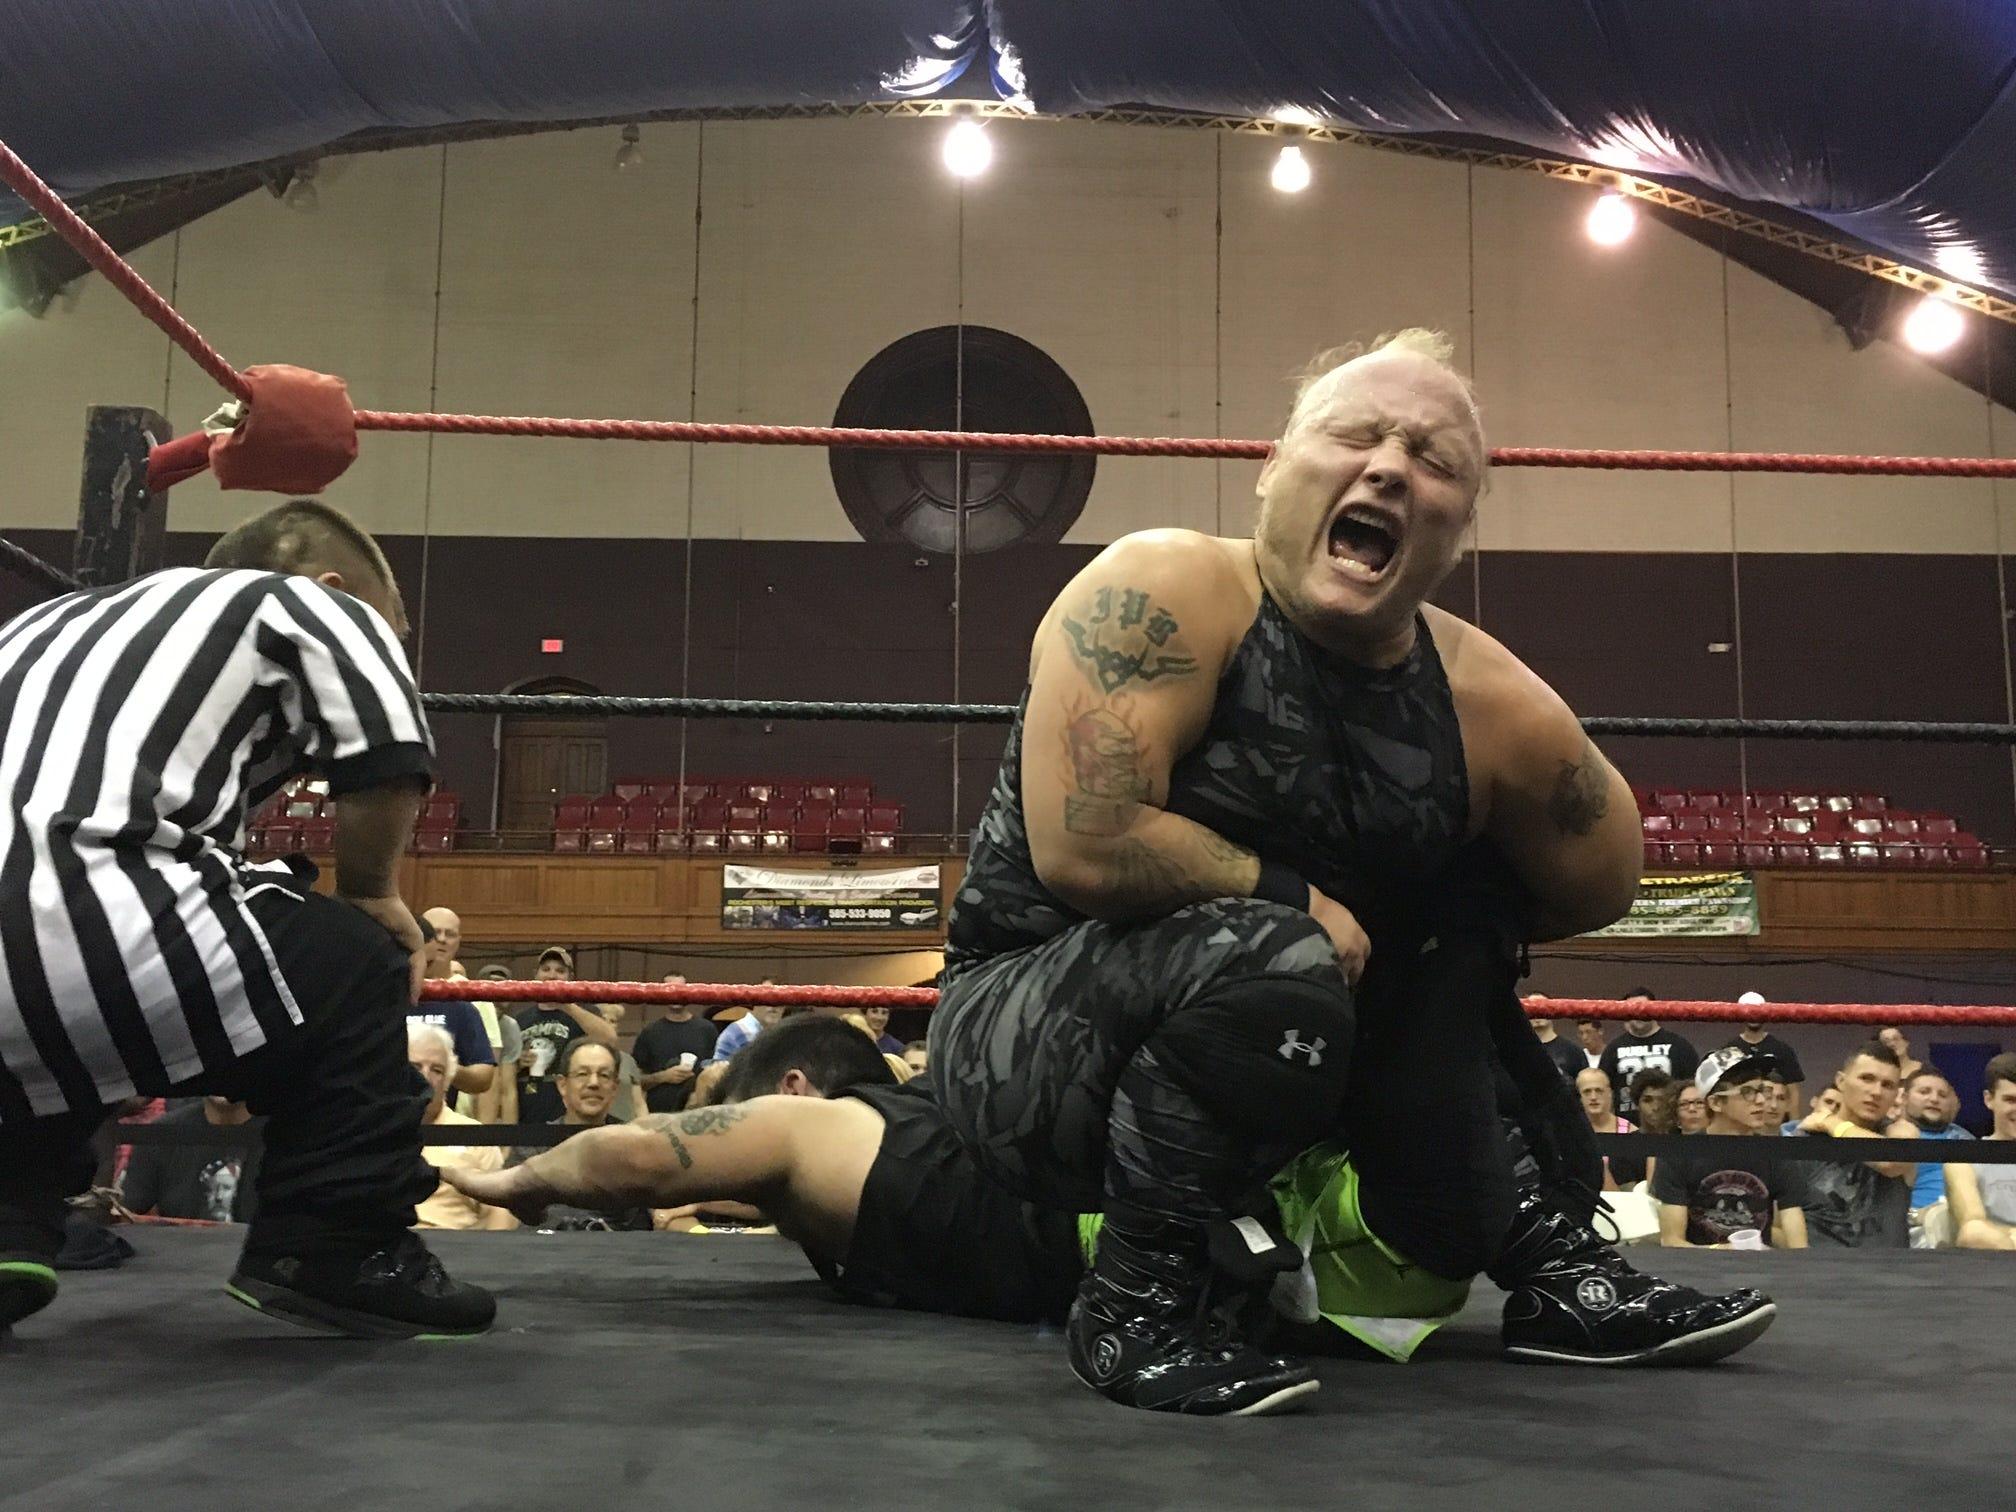 Mania midget pro wrestling